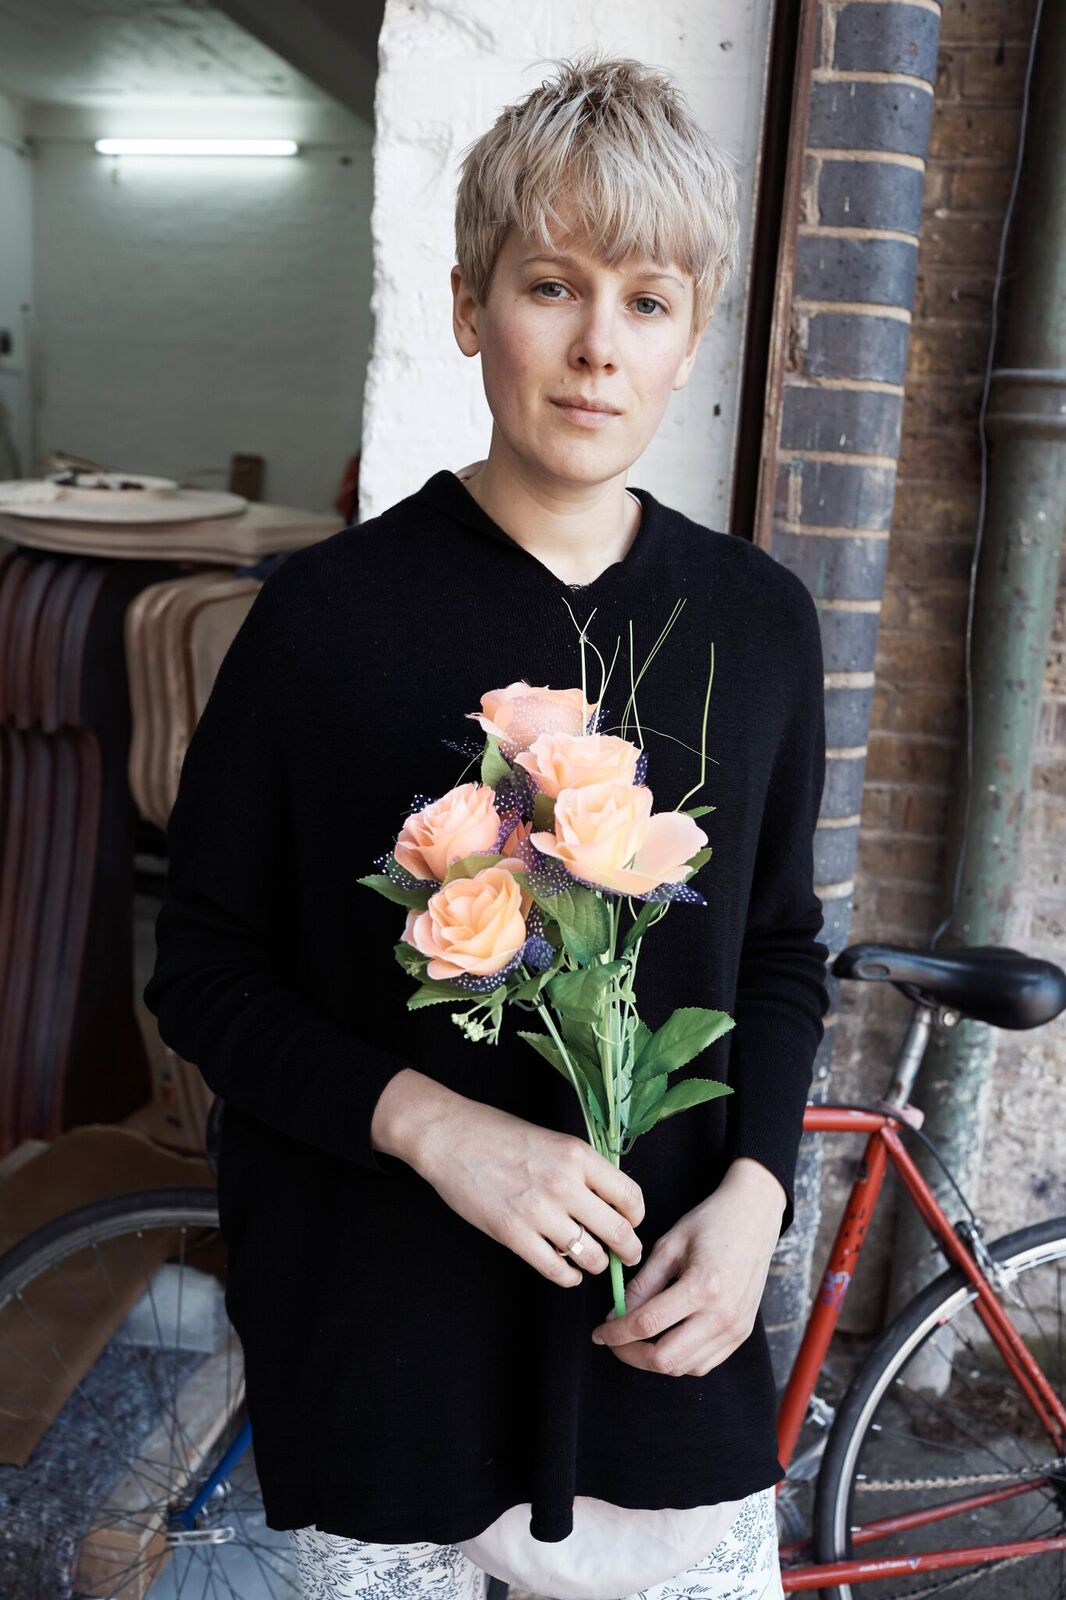 Helen Marten, artist for Turner Prize